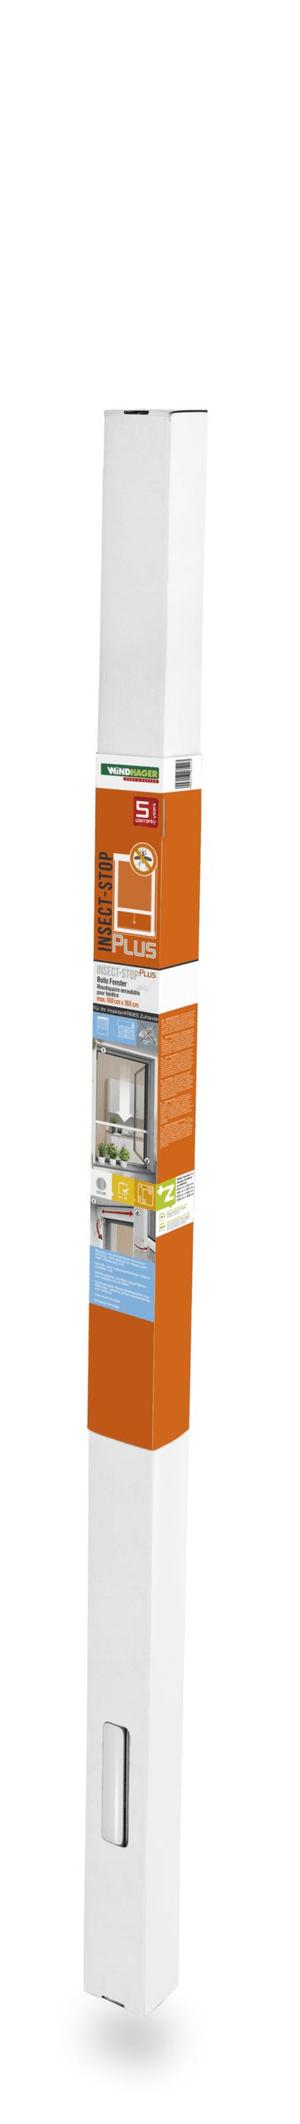 Insektenschutz Rollo Fenster 100x160cm aluminium